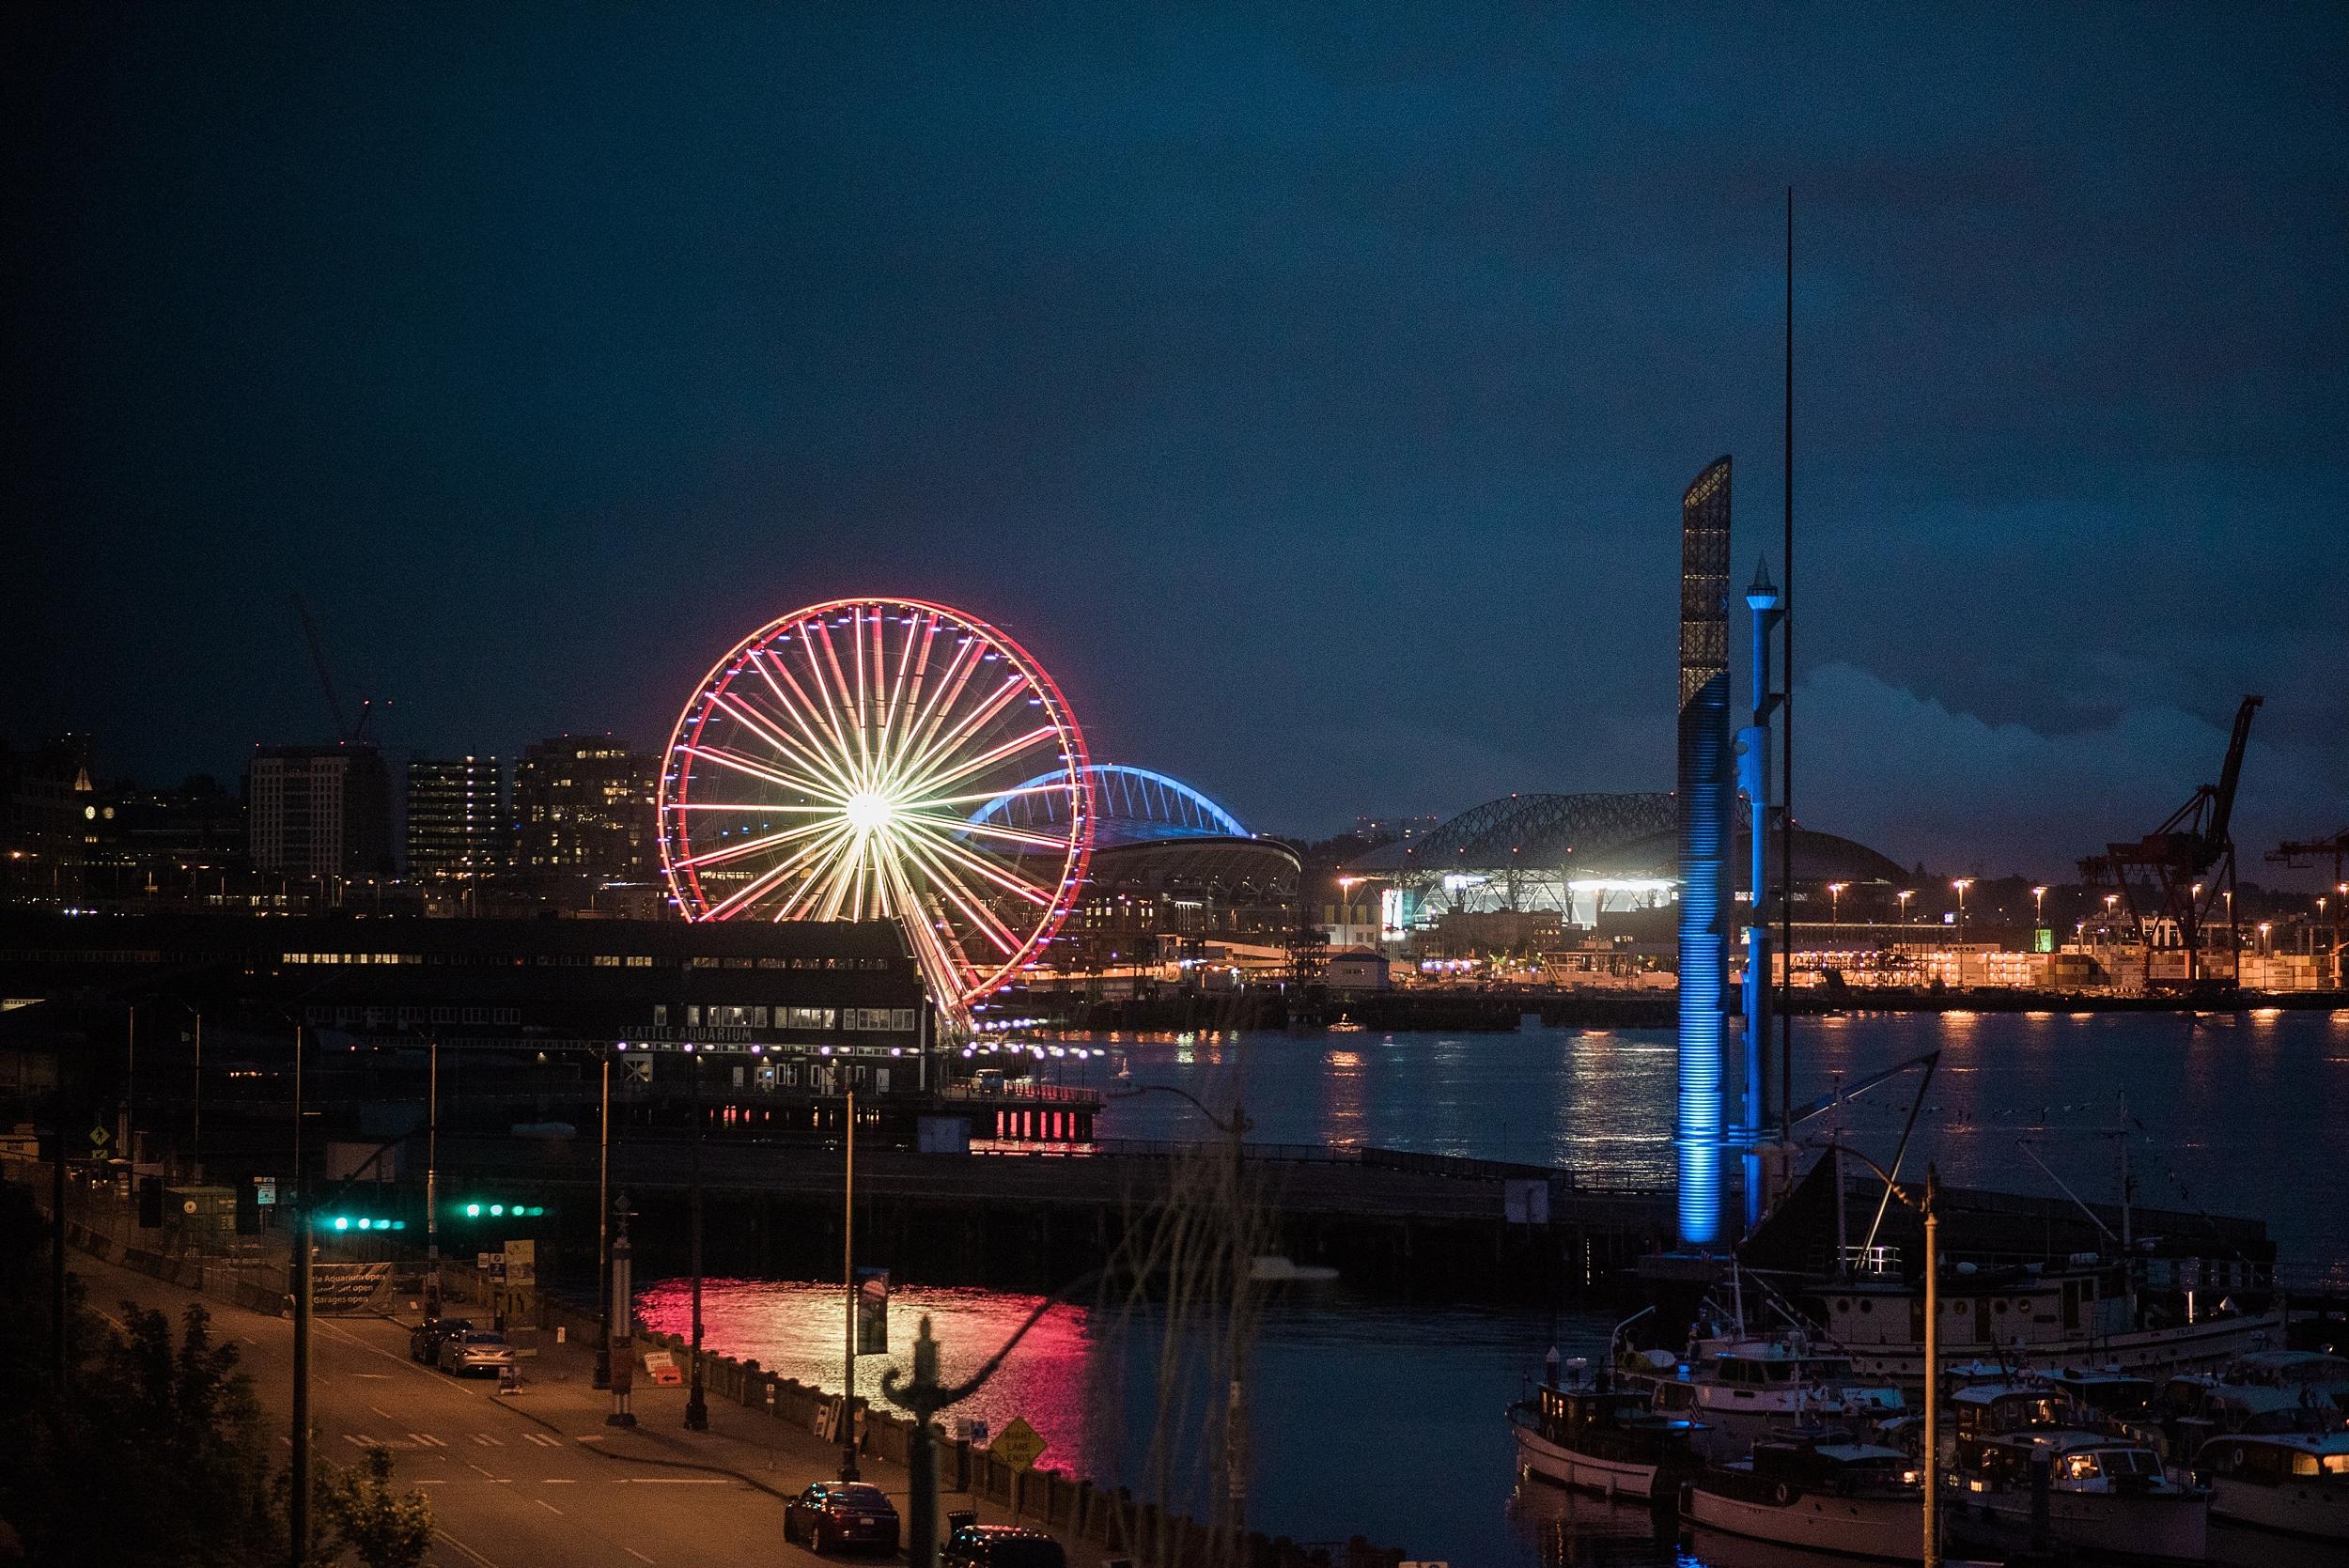 Seattle World Trade Center, Bell Harbor Conference Center, Seatt